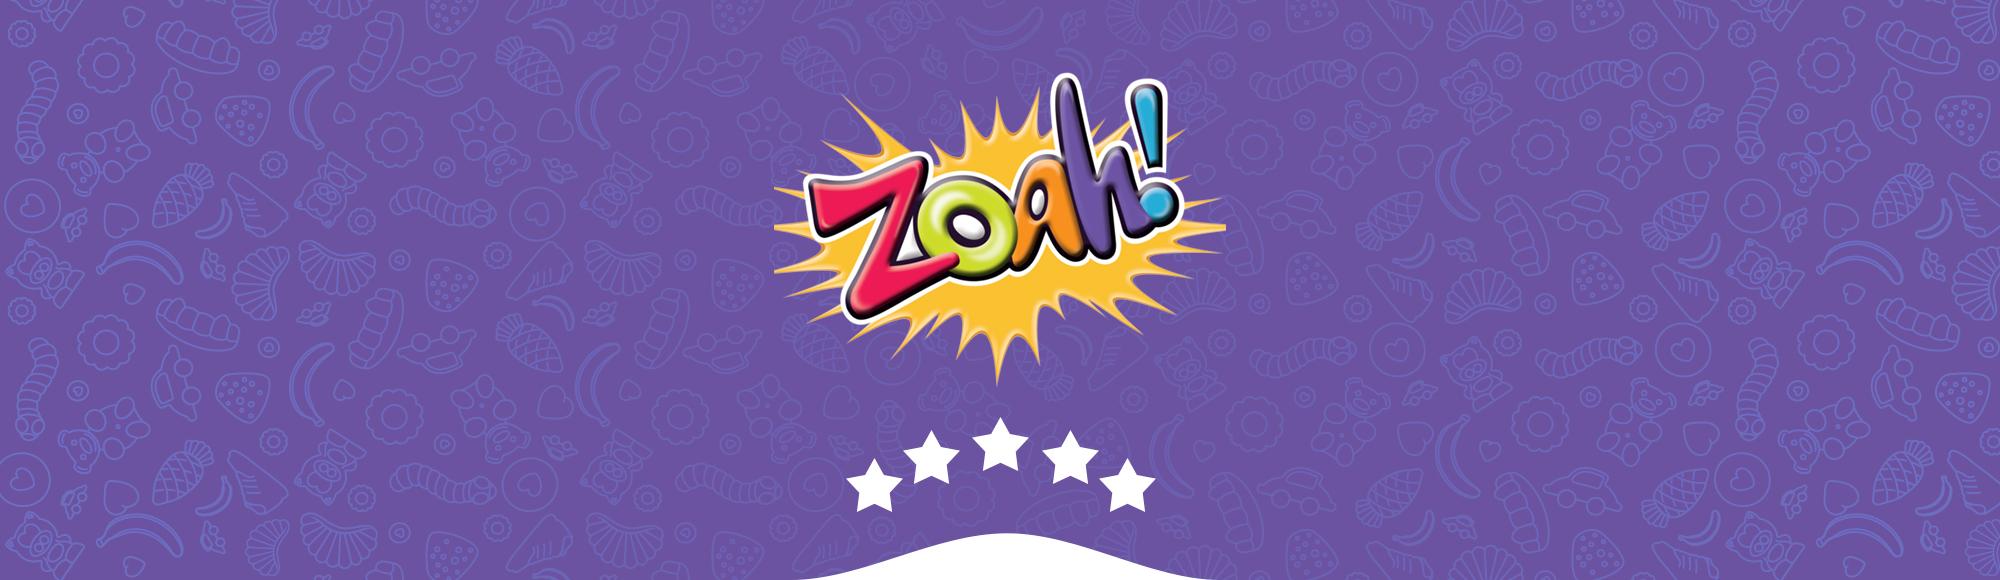 Banner Zoah!